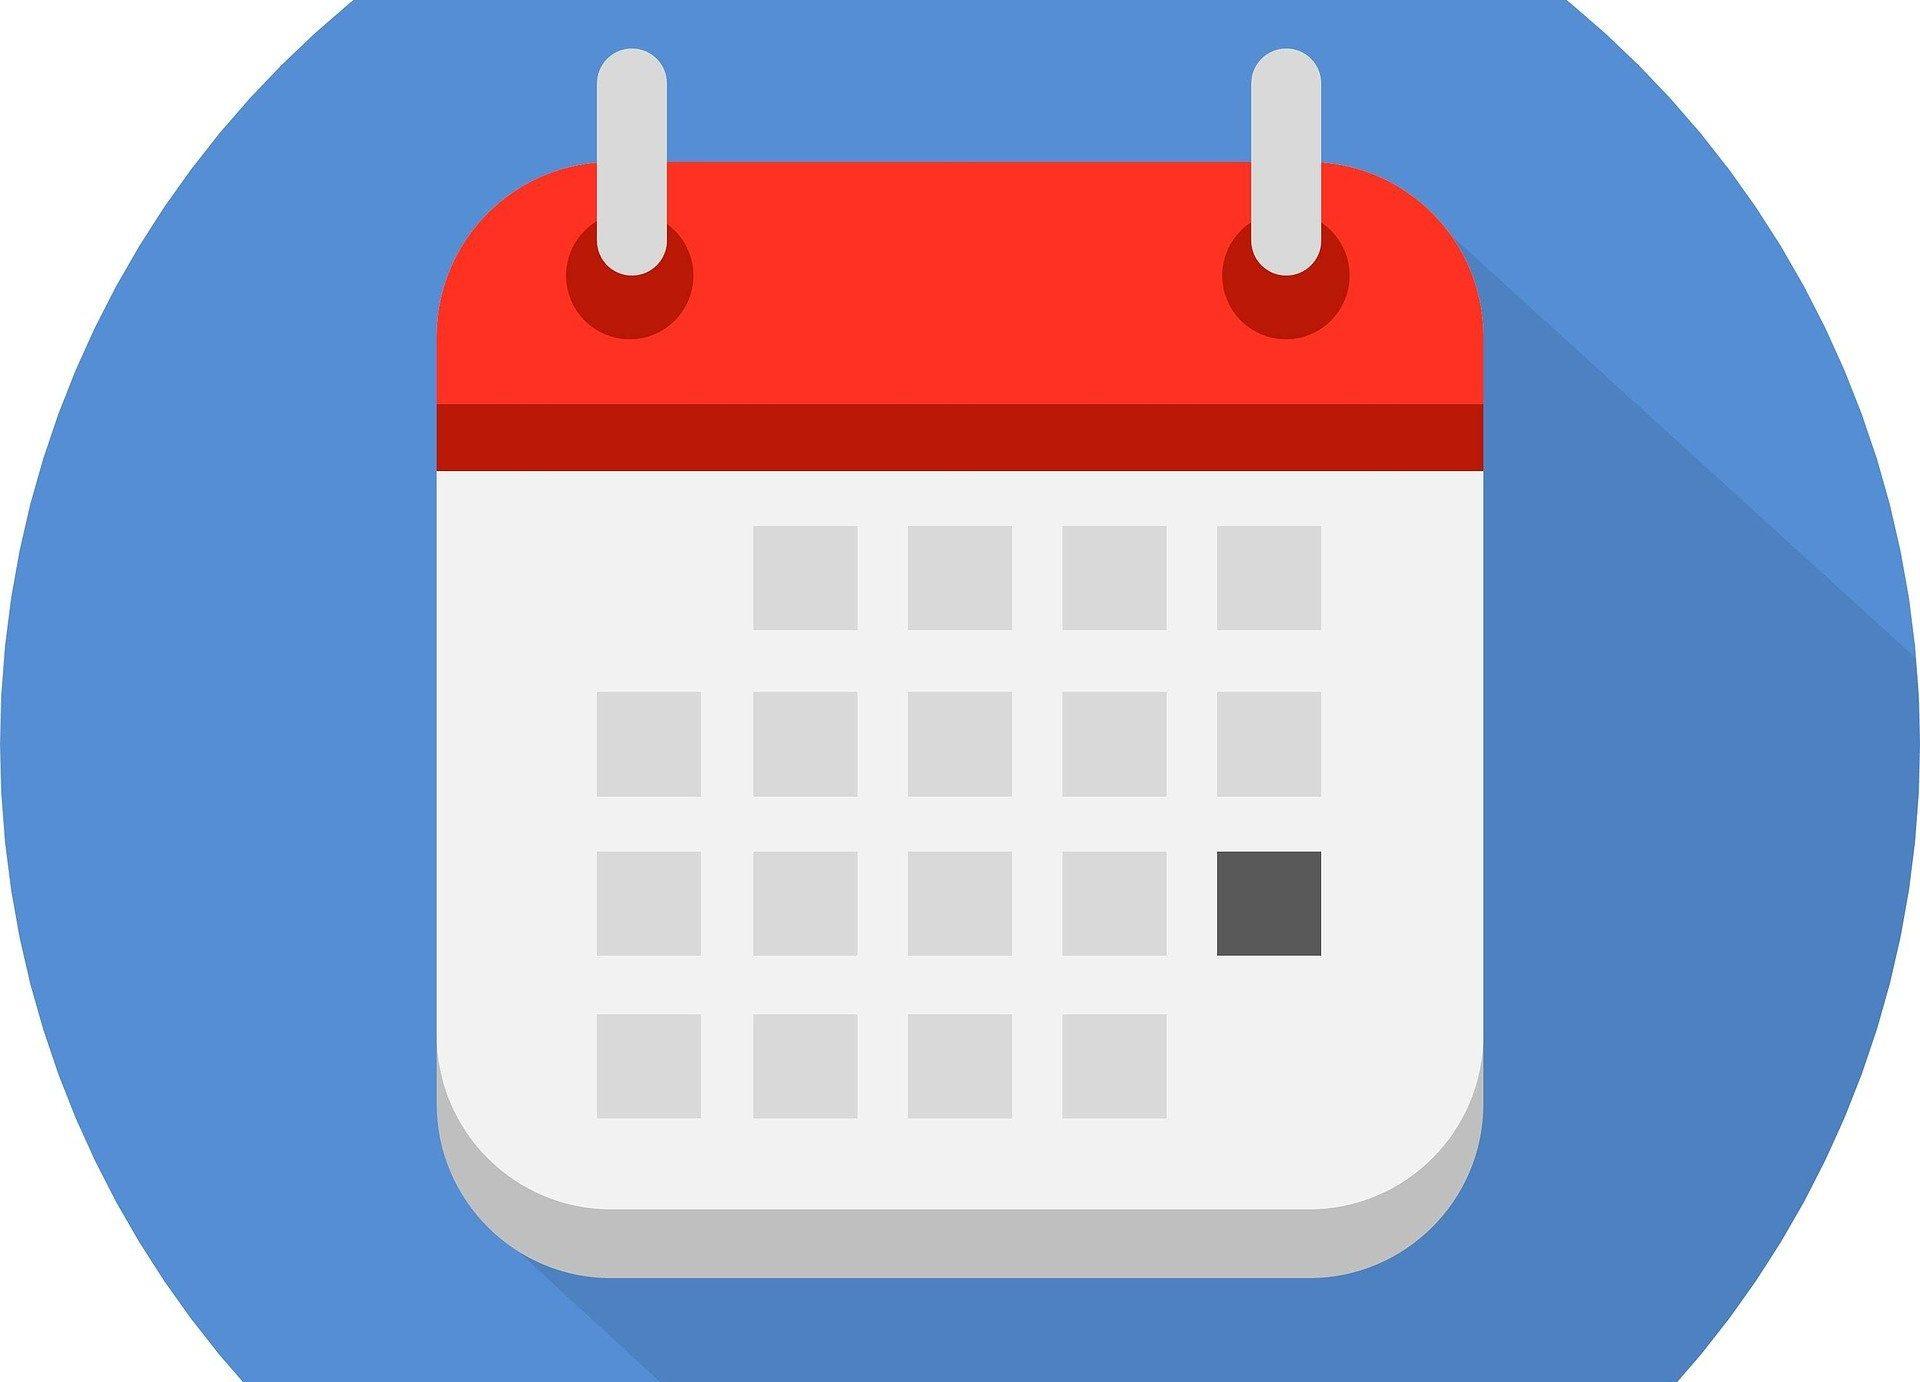 calendar-3906791_1920